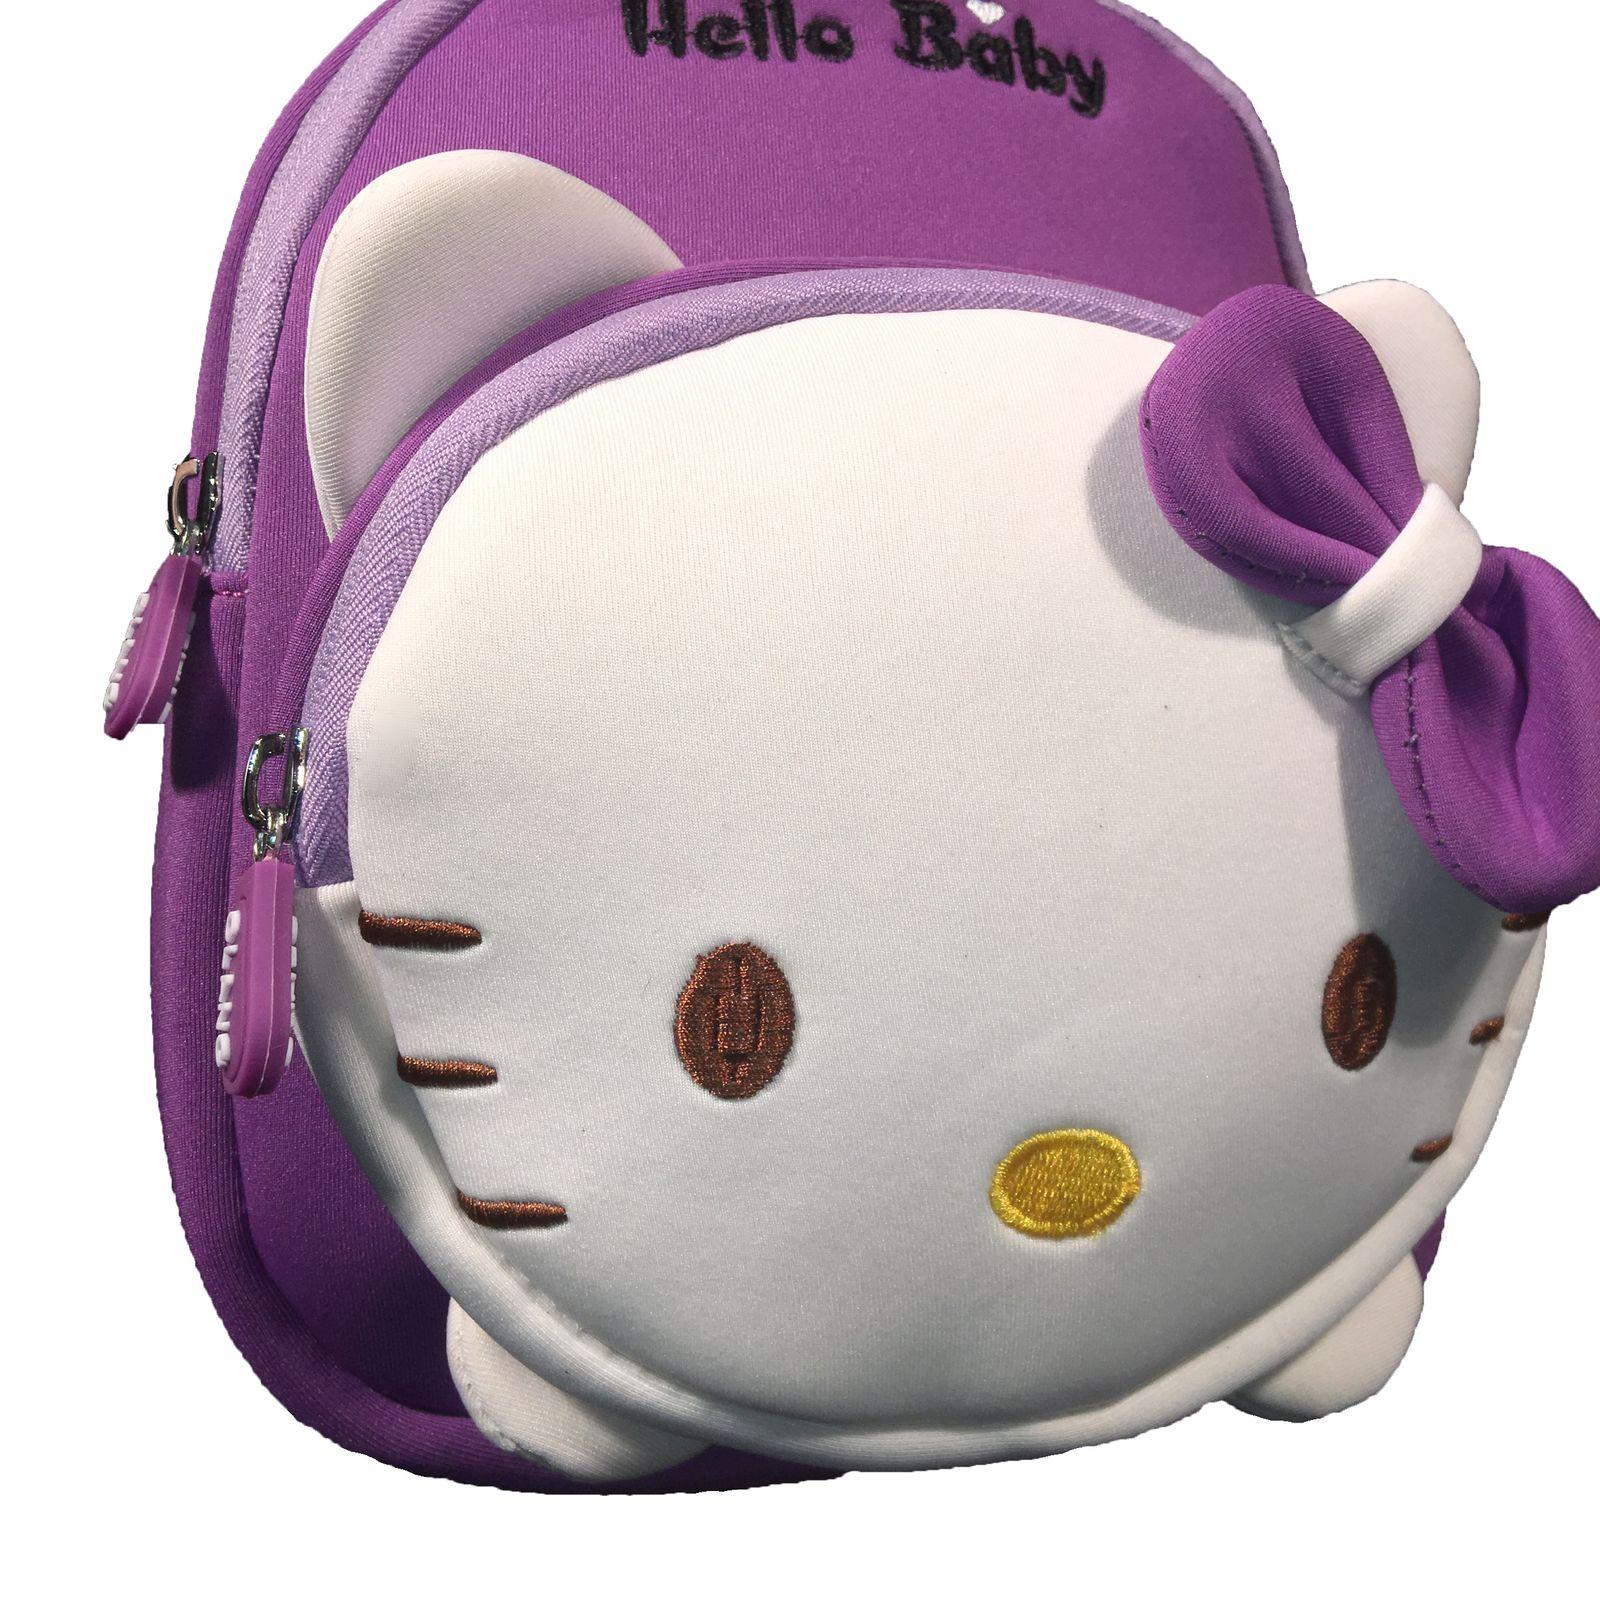 کوله پشتی دخترانه هلو بیبی کد adll3 -  - 12